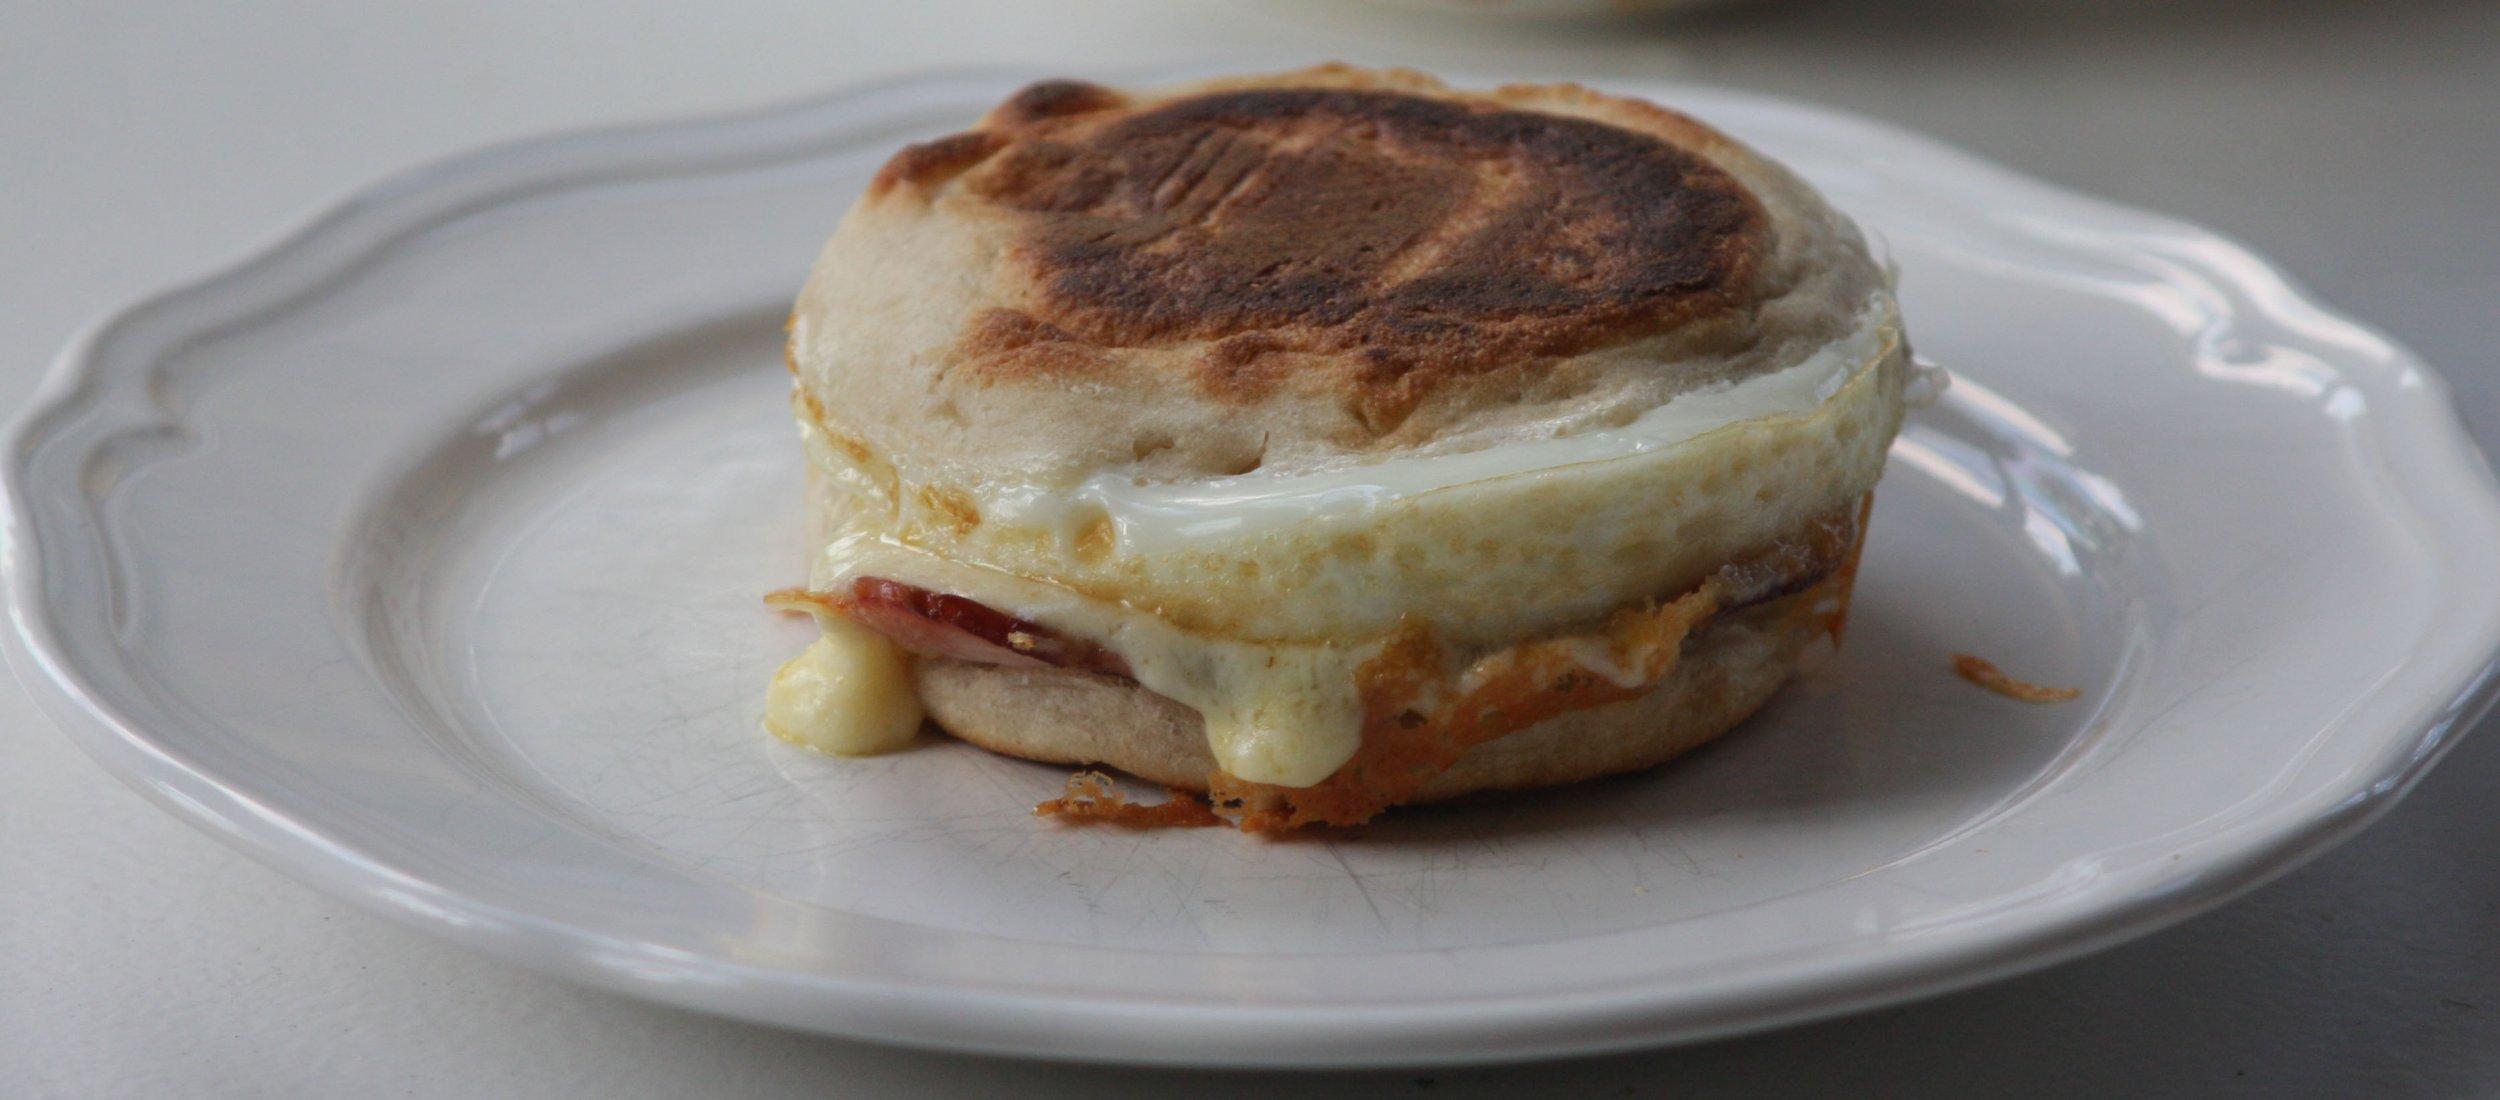 11-29-13_LS0143_Sandwich1